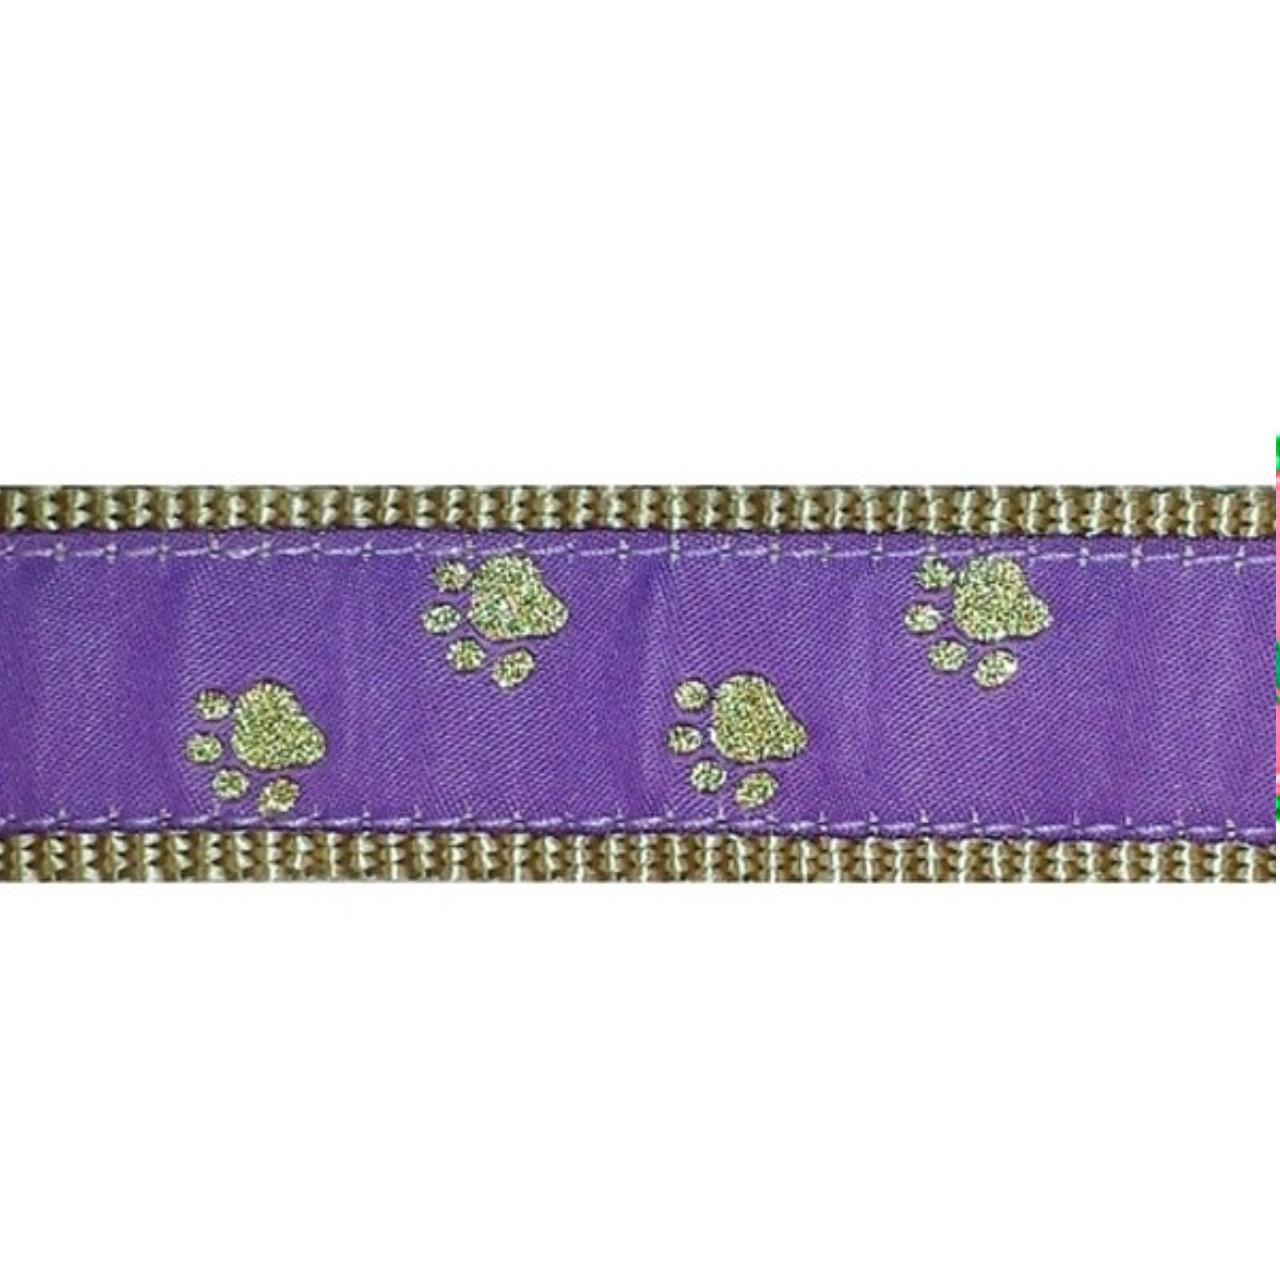 PRESTON Gold Paws on Purple Dog Collar